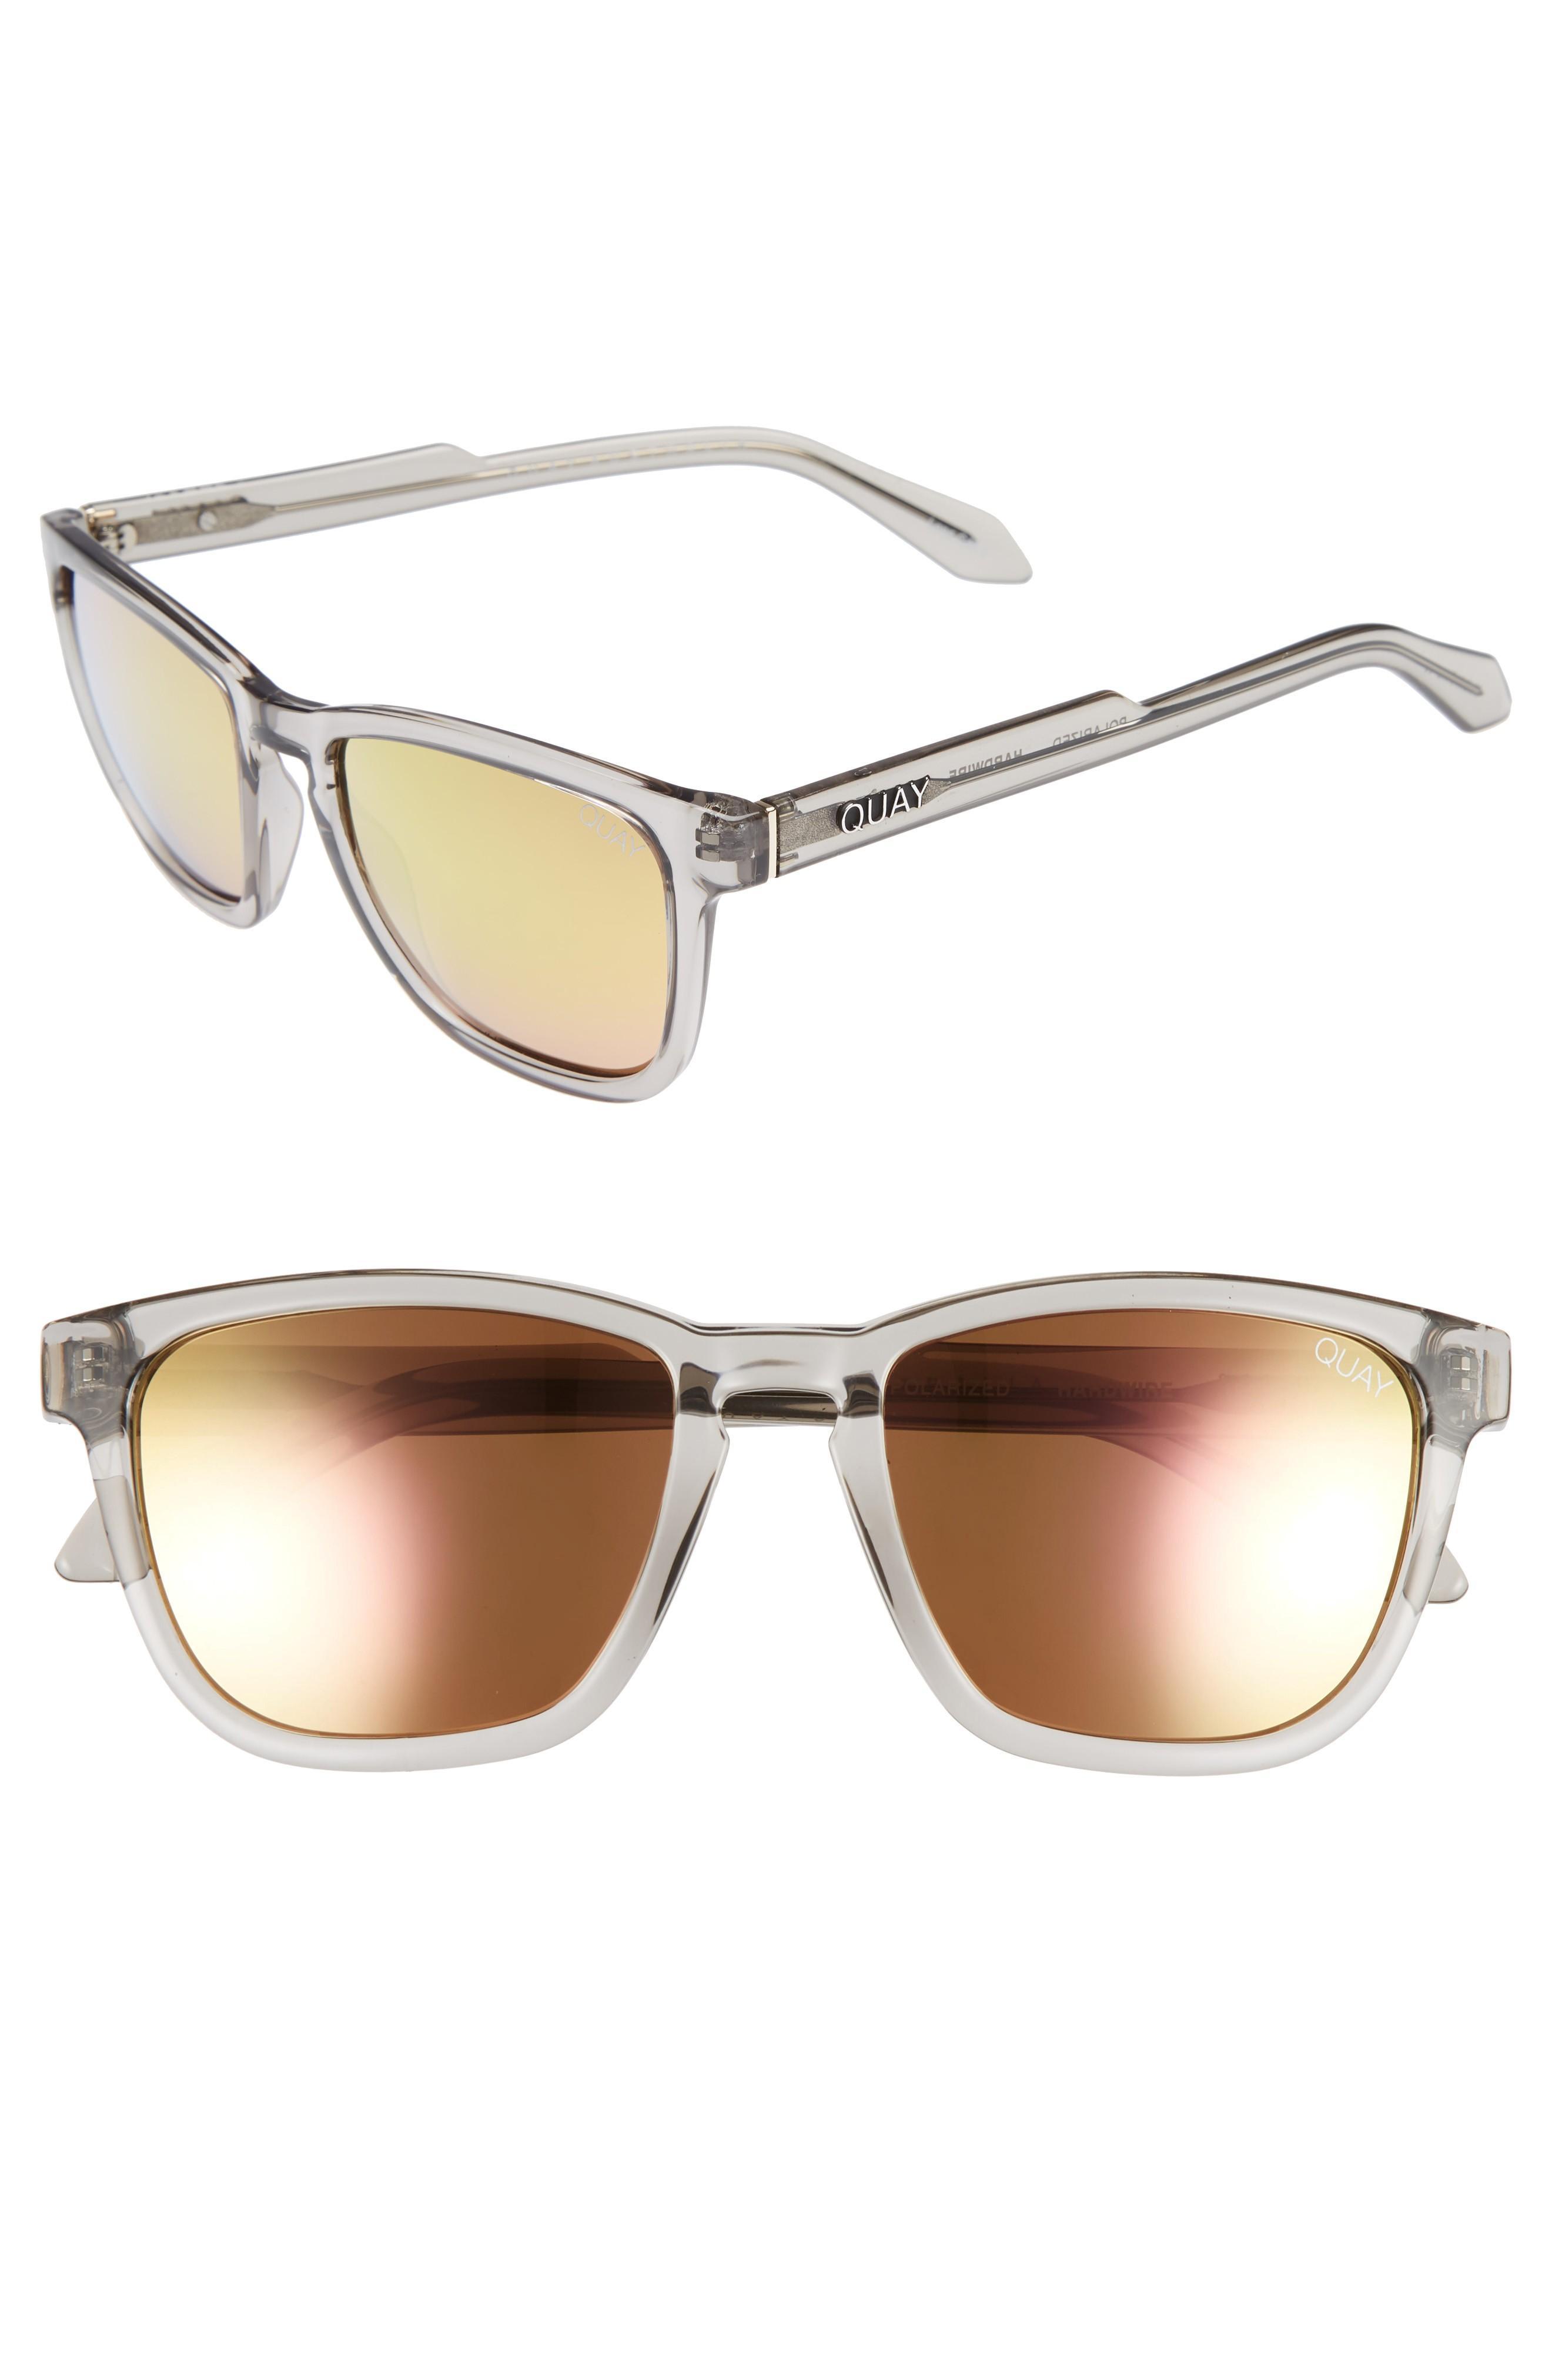 9a37587d39 Quay Hardwire 54Mm Polarized Sunglasses - Grey   Peach Mirror